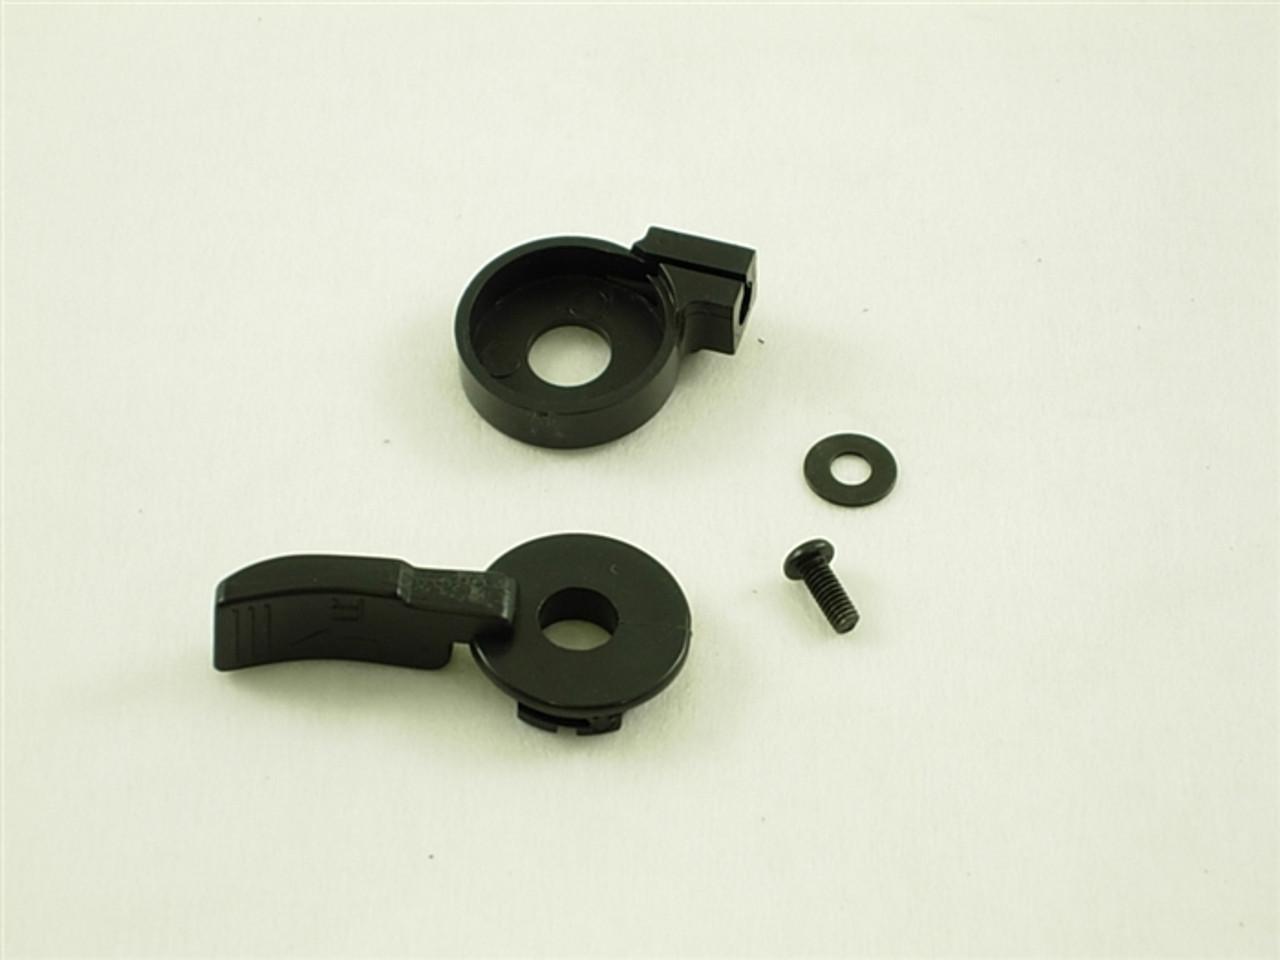 choke lever assembly 10058-a4-4